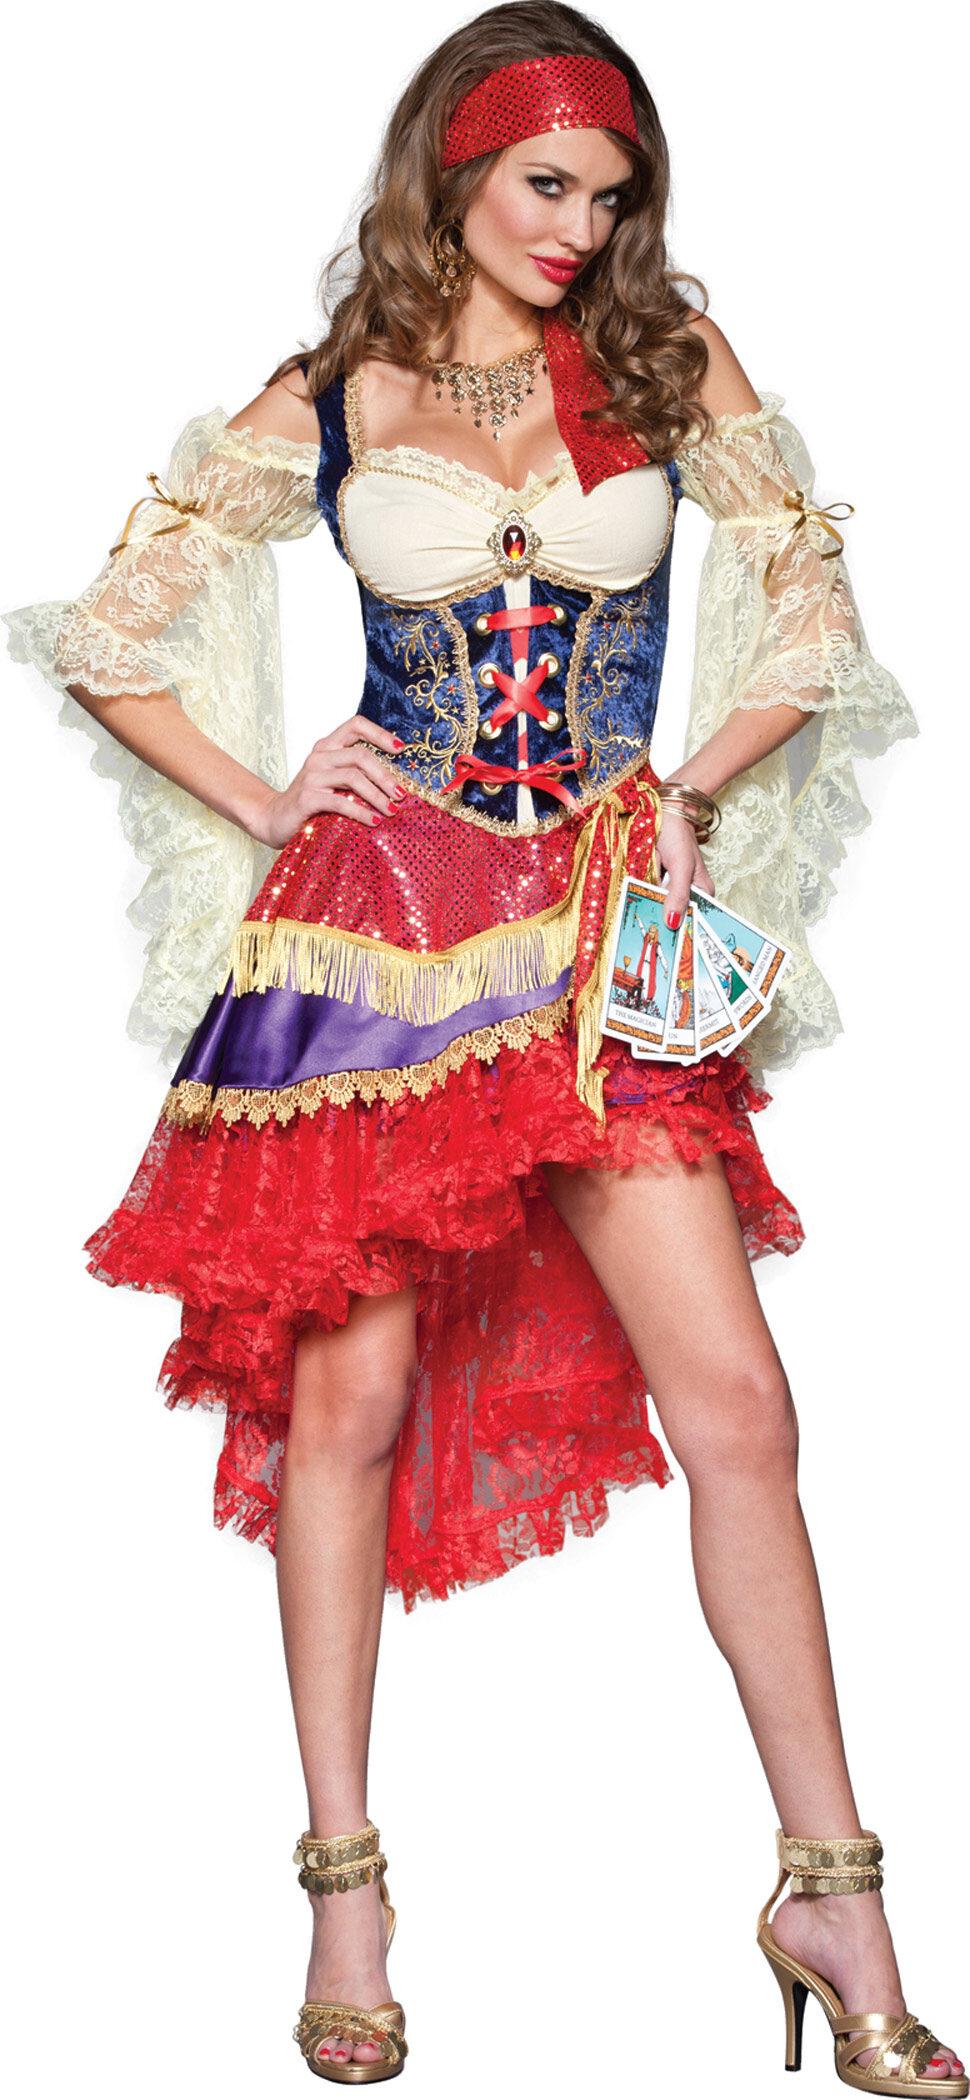 chloe grace moretz hot mini skirt pics